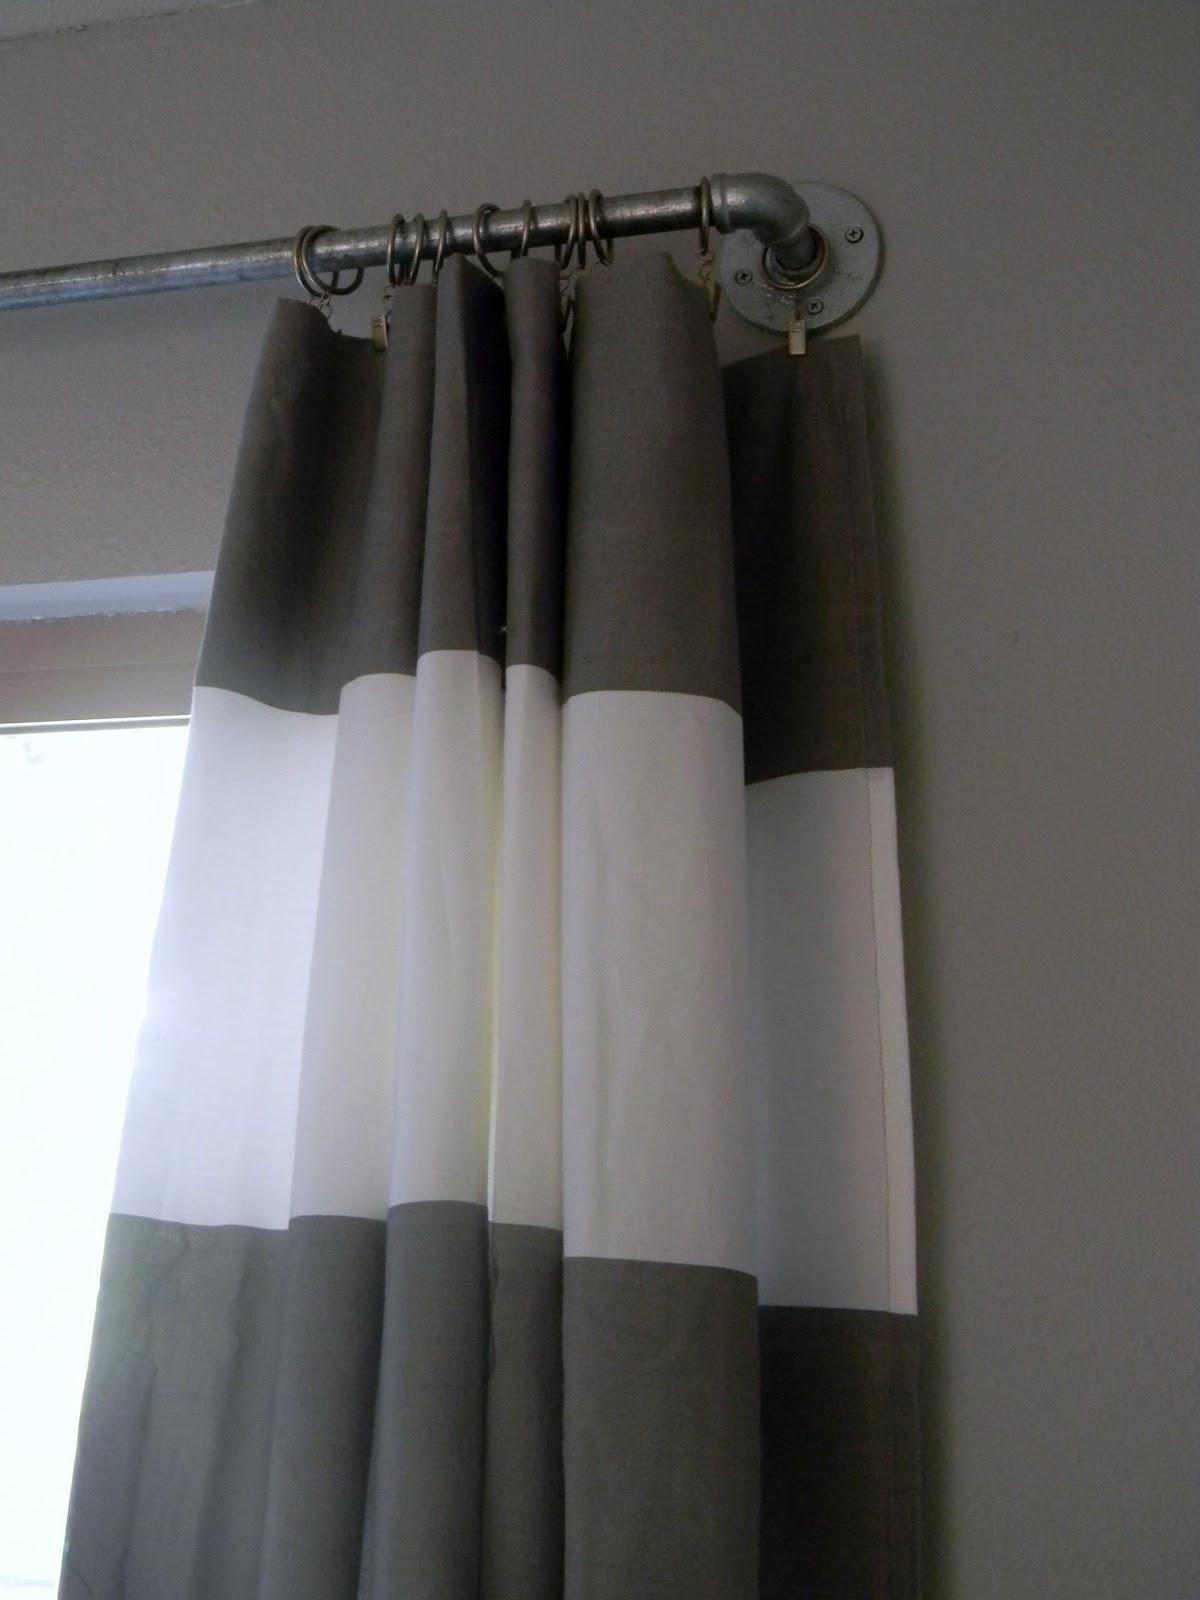 diy west elm curtain rod striped curtains schue love. Black Bedroom Furniture Sets. Home Design Ideas